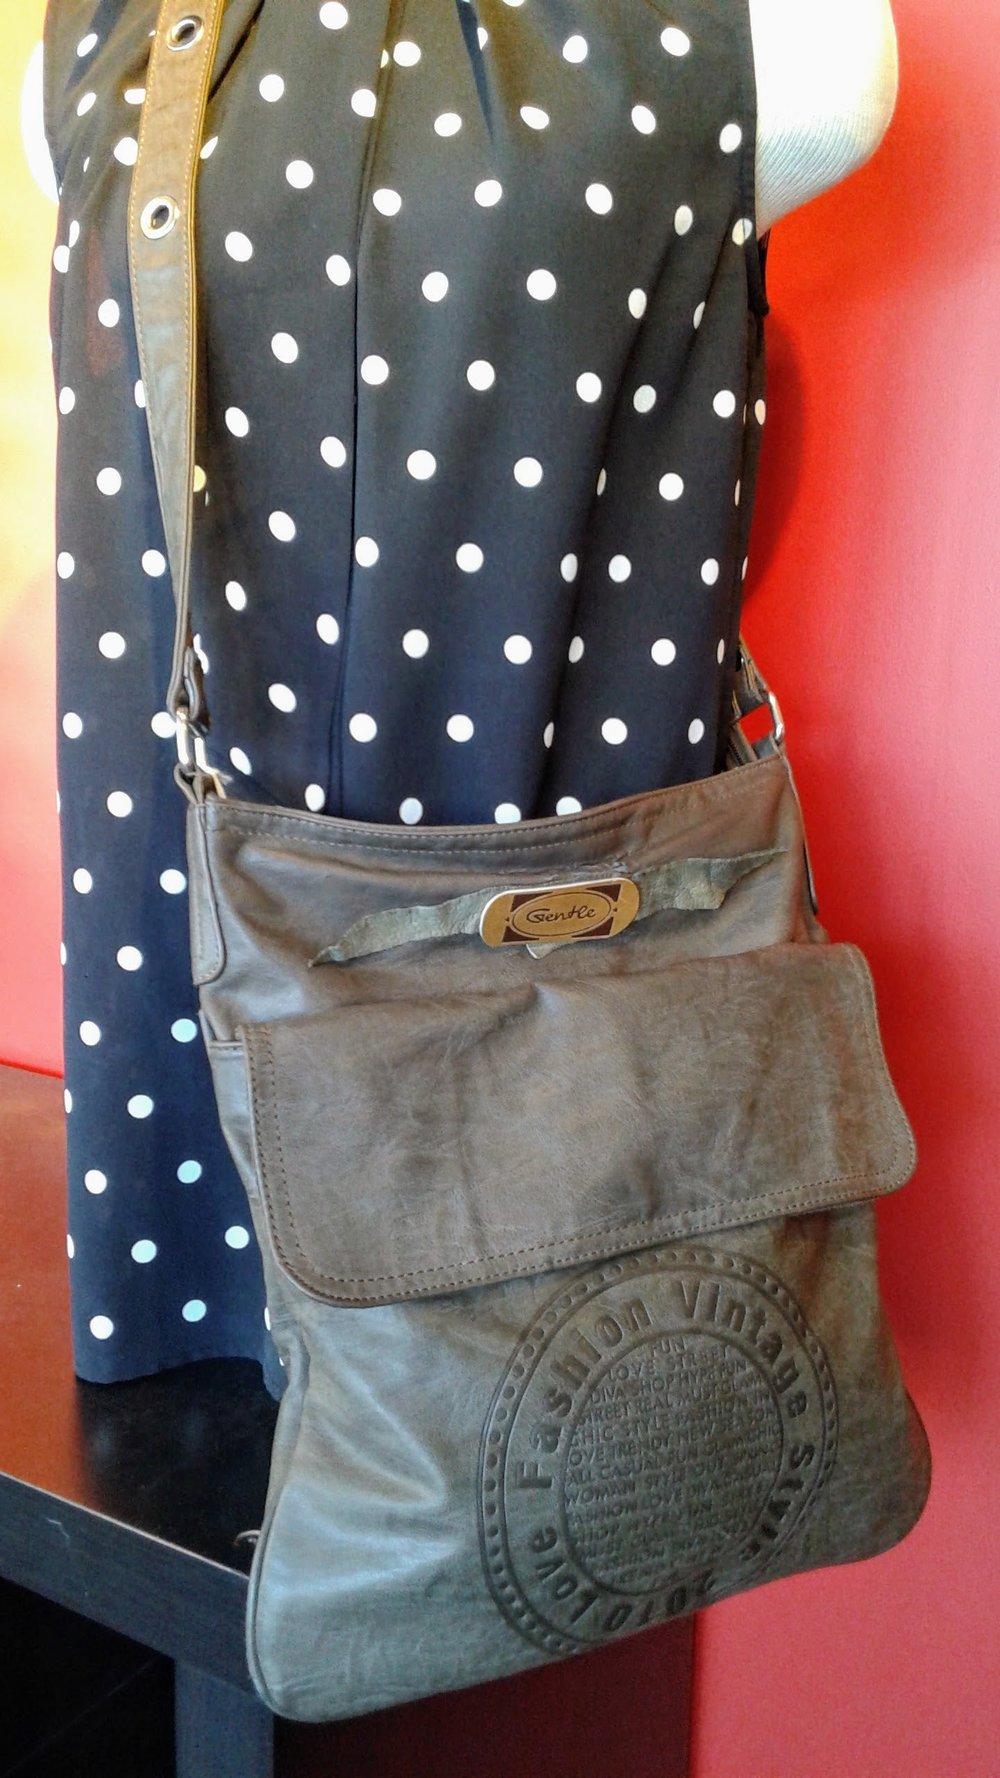 Gentle Vintage cross-body bag, $18